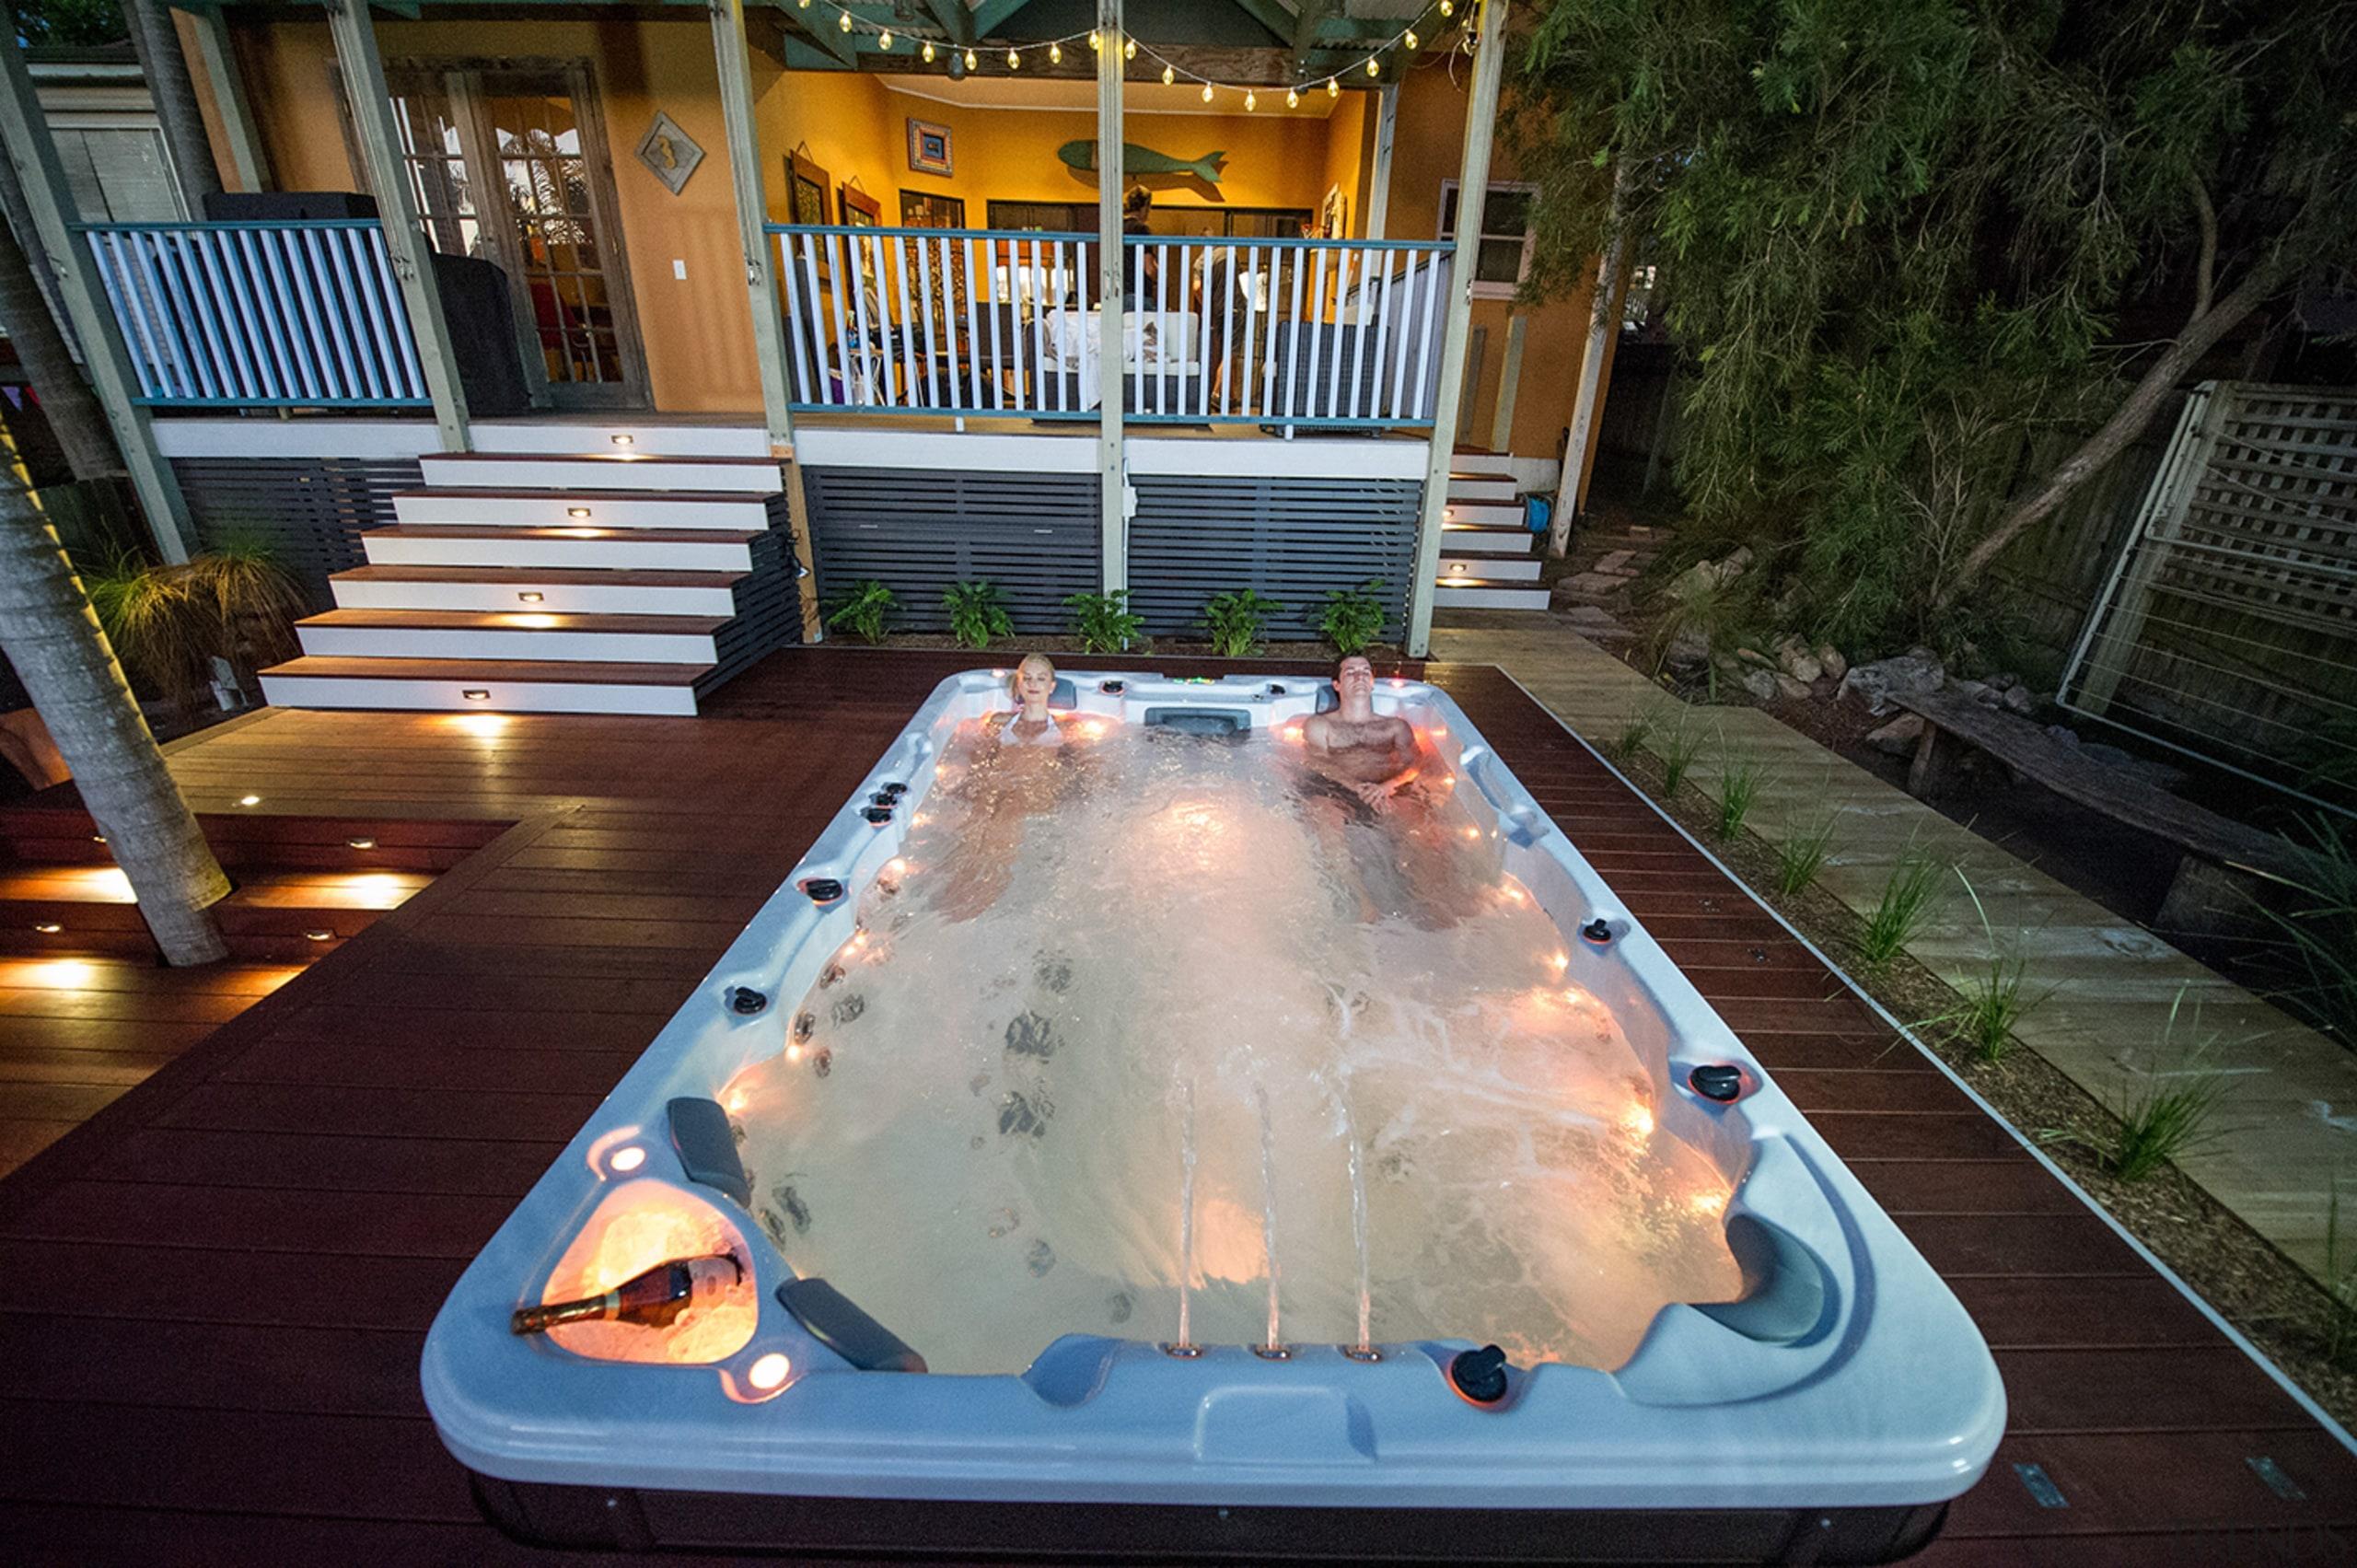 Oasis 064 - hot tub | jacuzzi | hot tub, jacuzzi, leisure, swimming pool, black